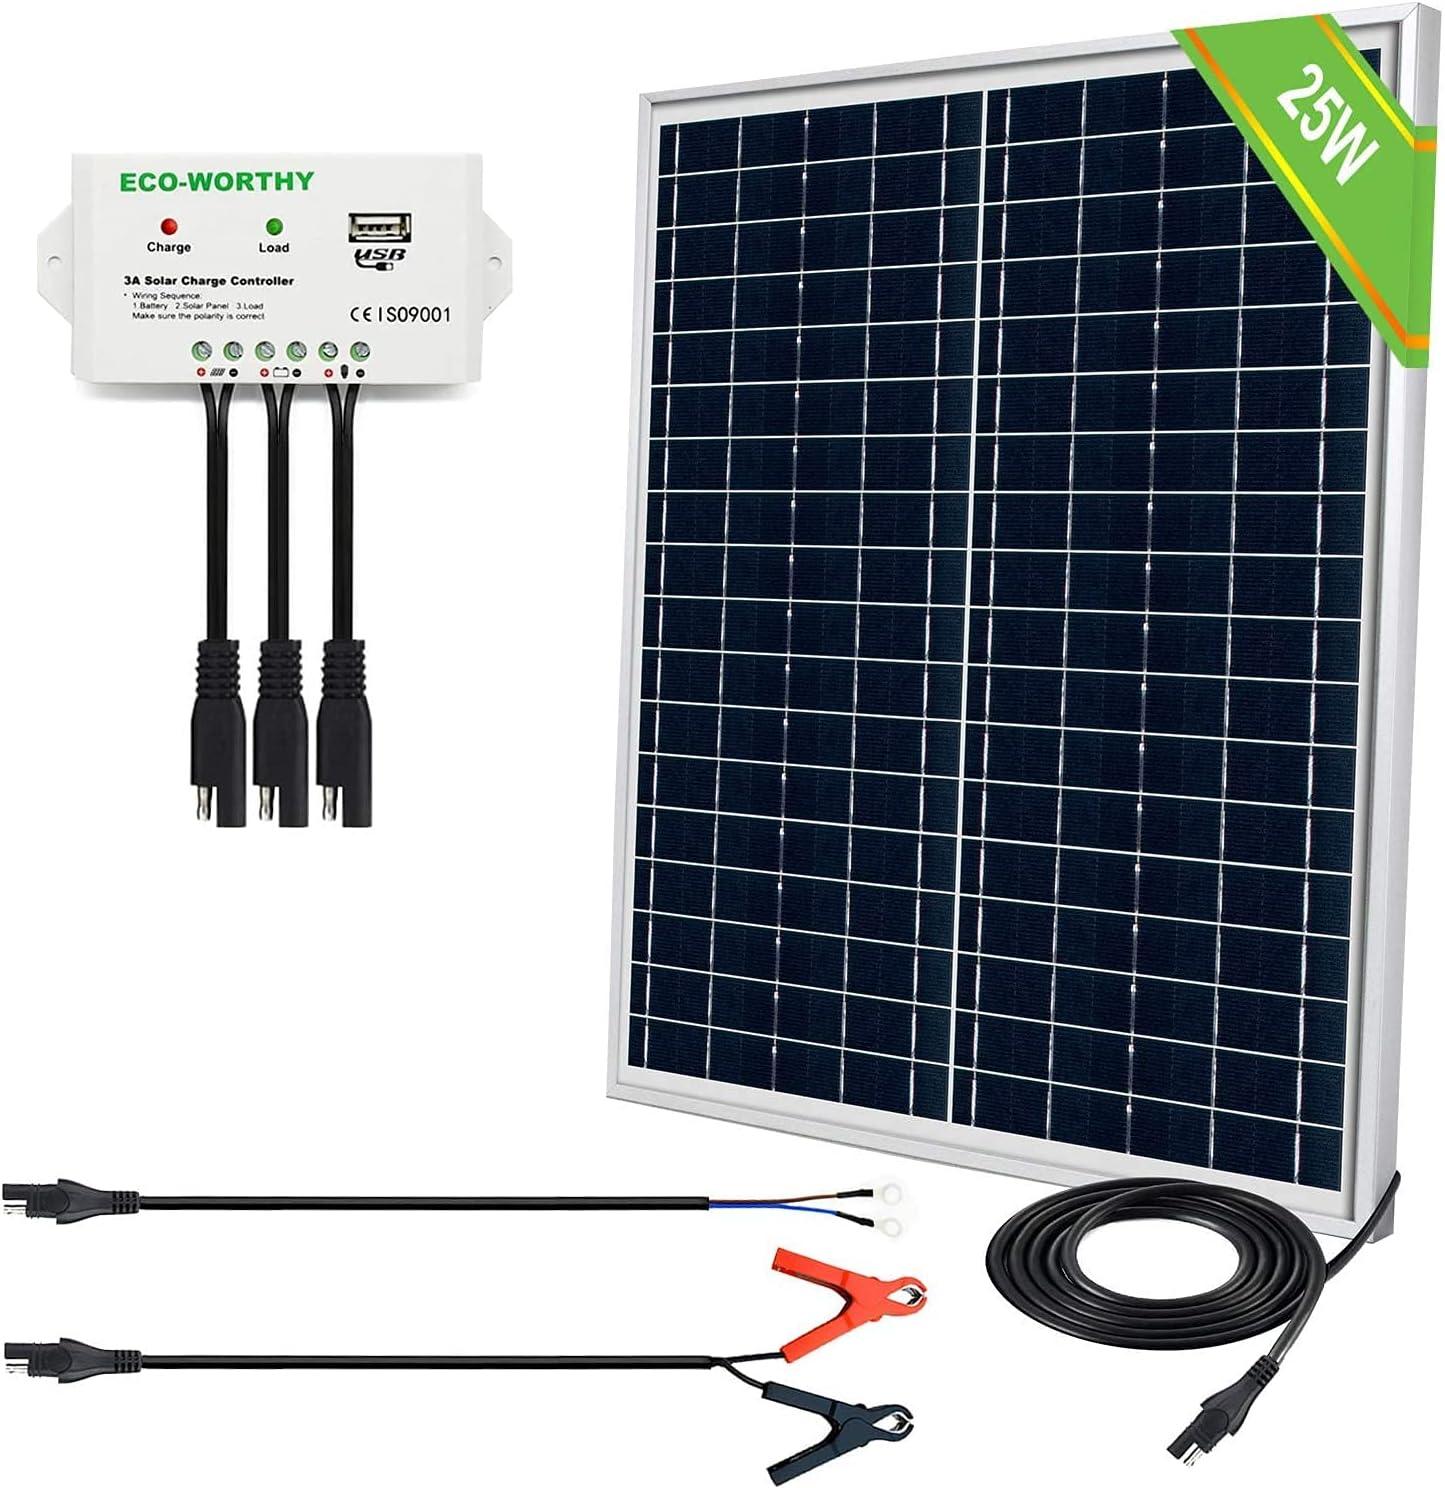 ECO-WORTHY 25 Watts 12V Off Grid Solar Panel SAE Connector Kit